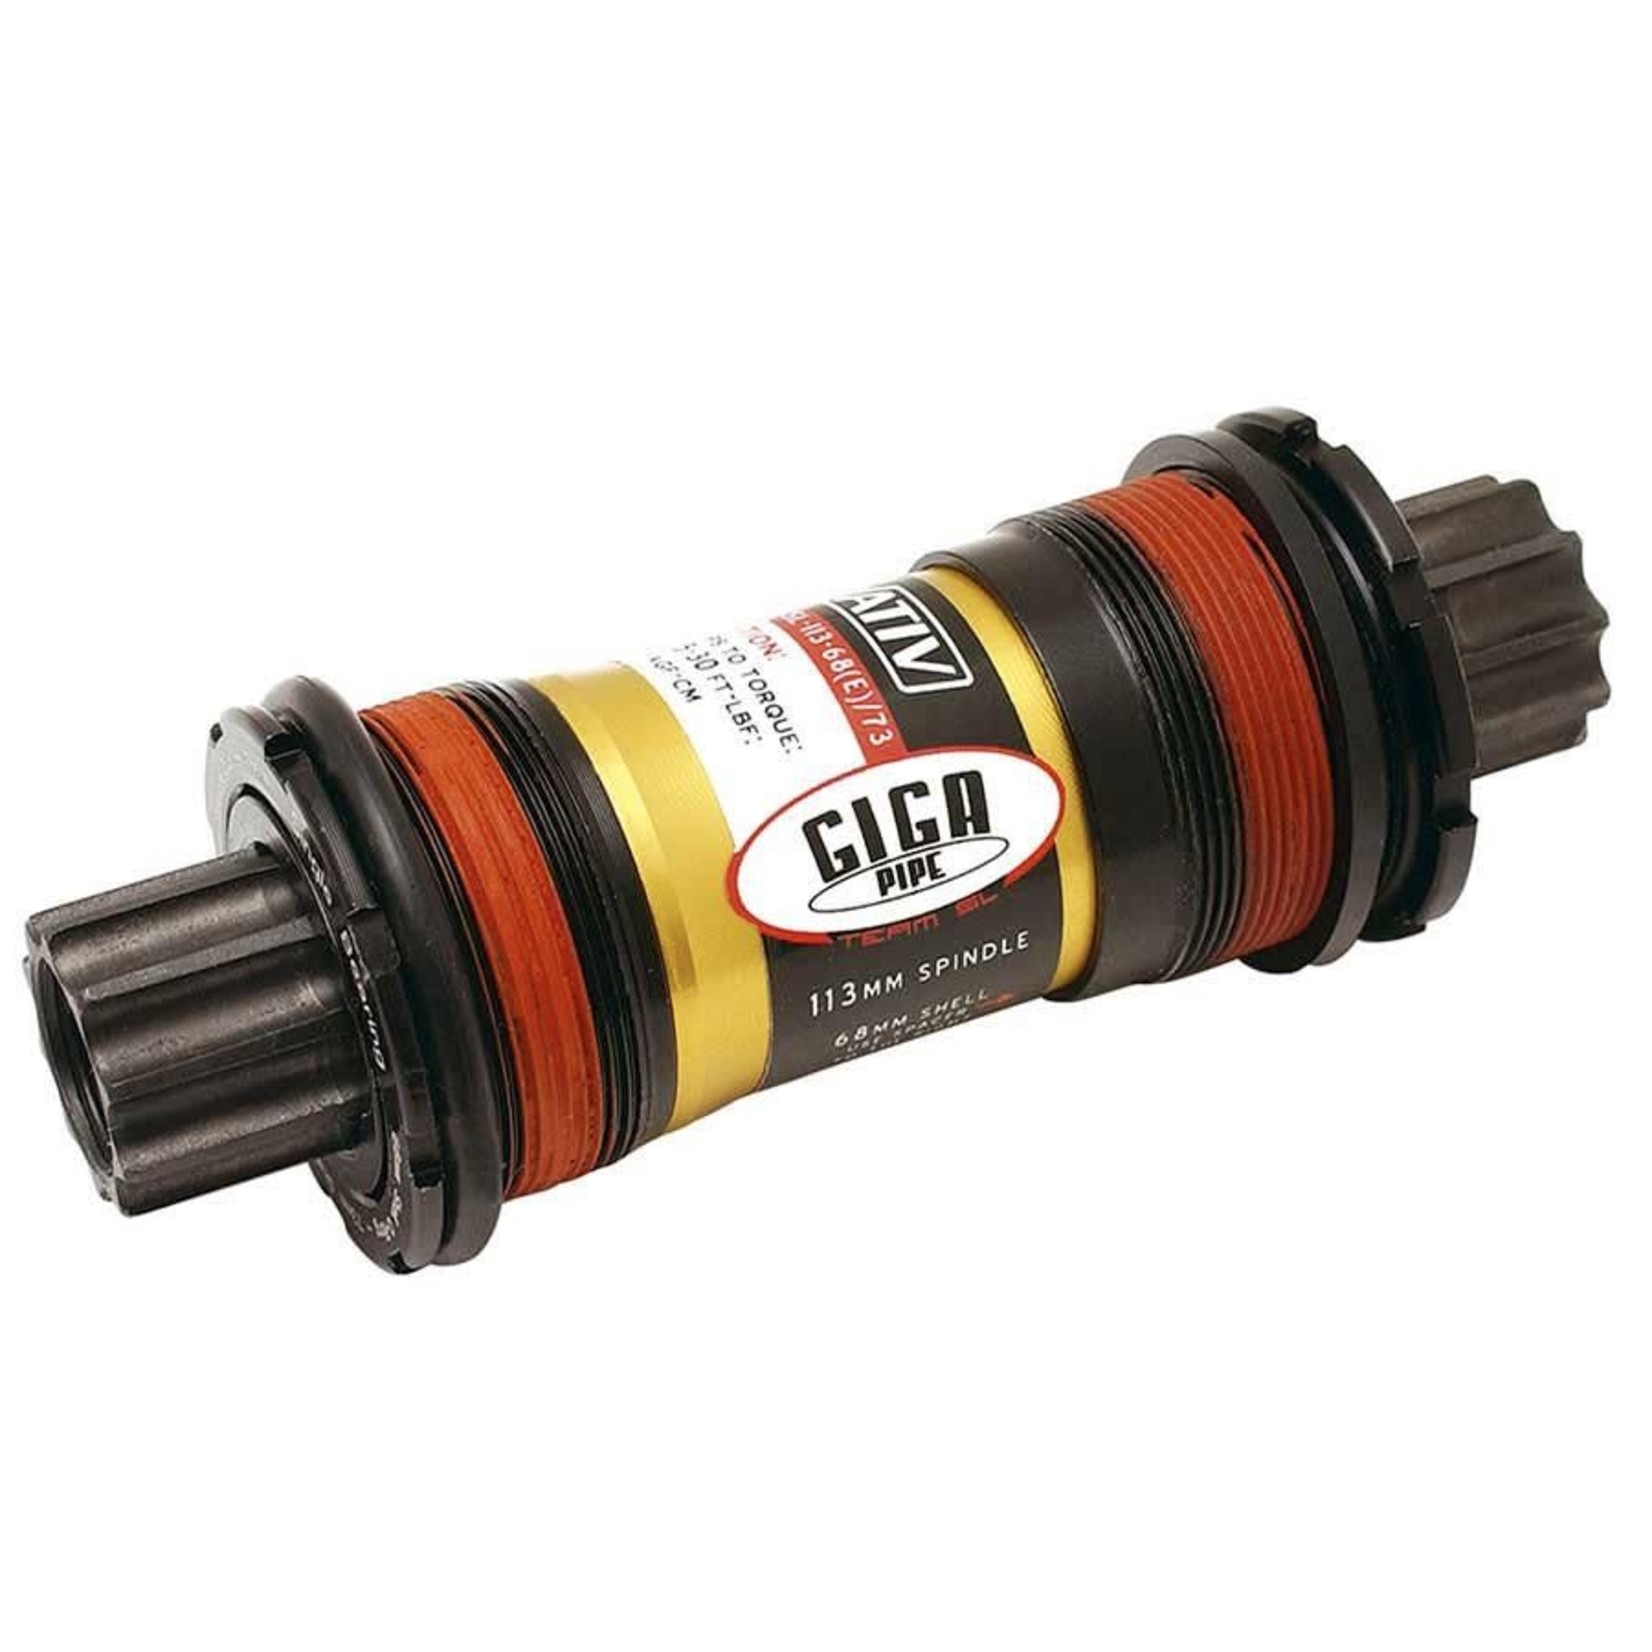 Truvativ Giga Pipe SL, Jeu de pedalier ISIS, BSA, 68/E/73mm, 118mm, Acier, Noir, 00.6415.010.000